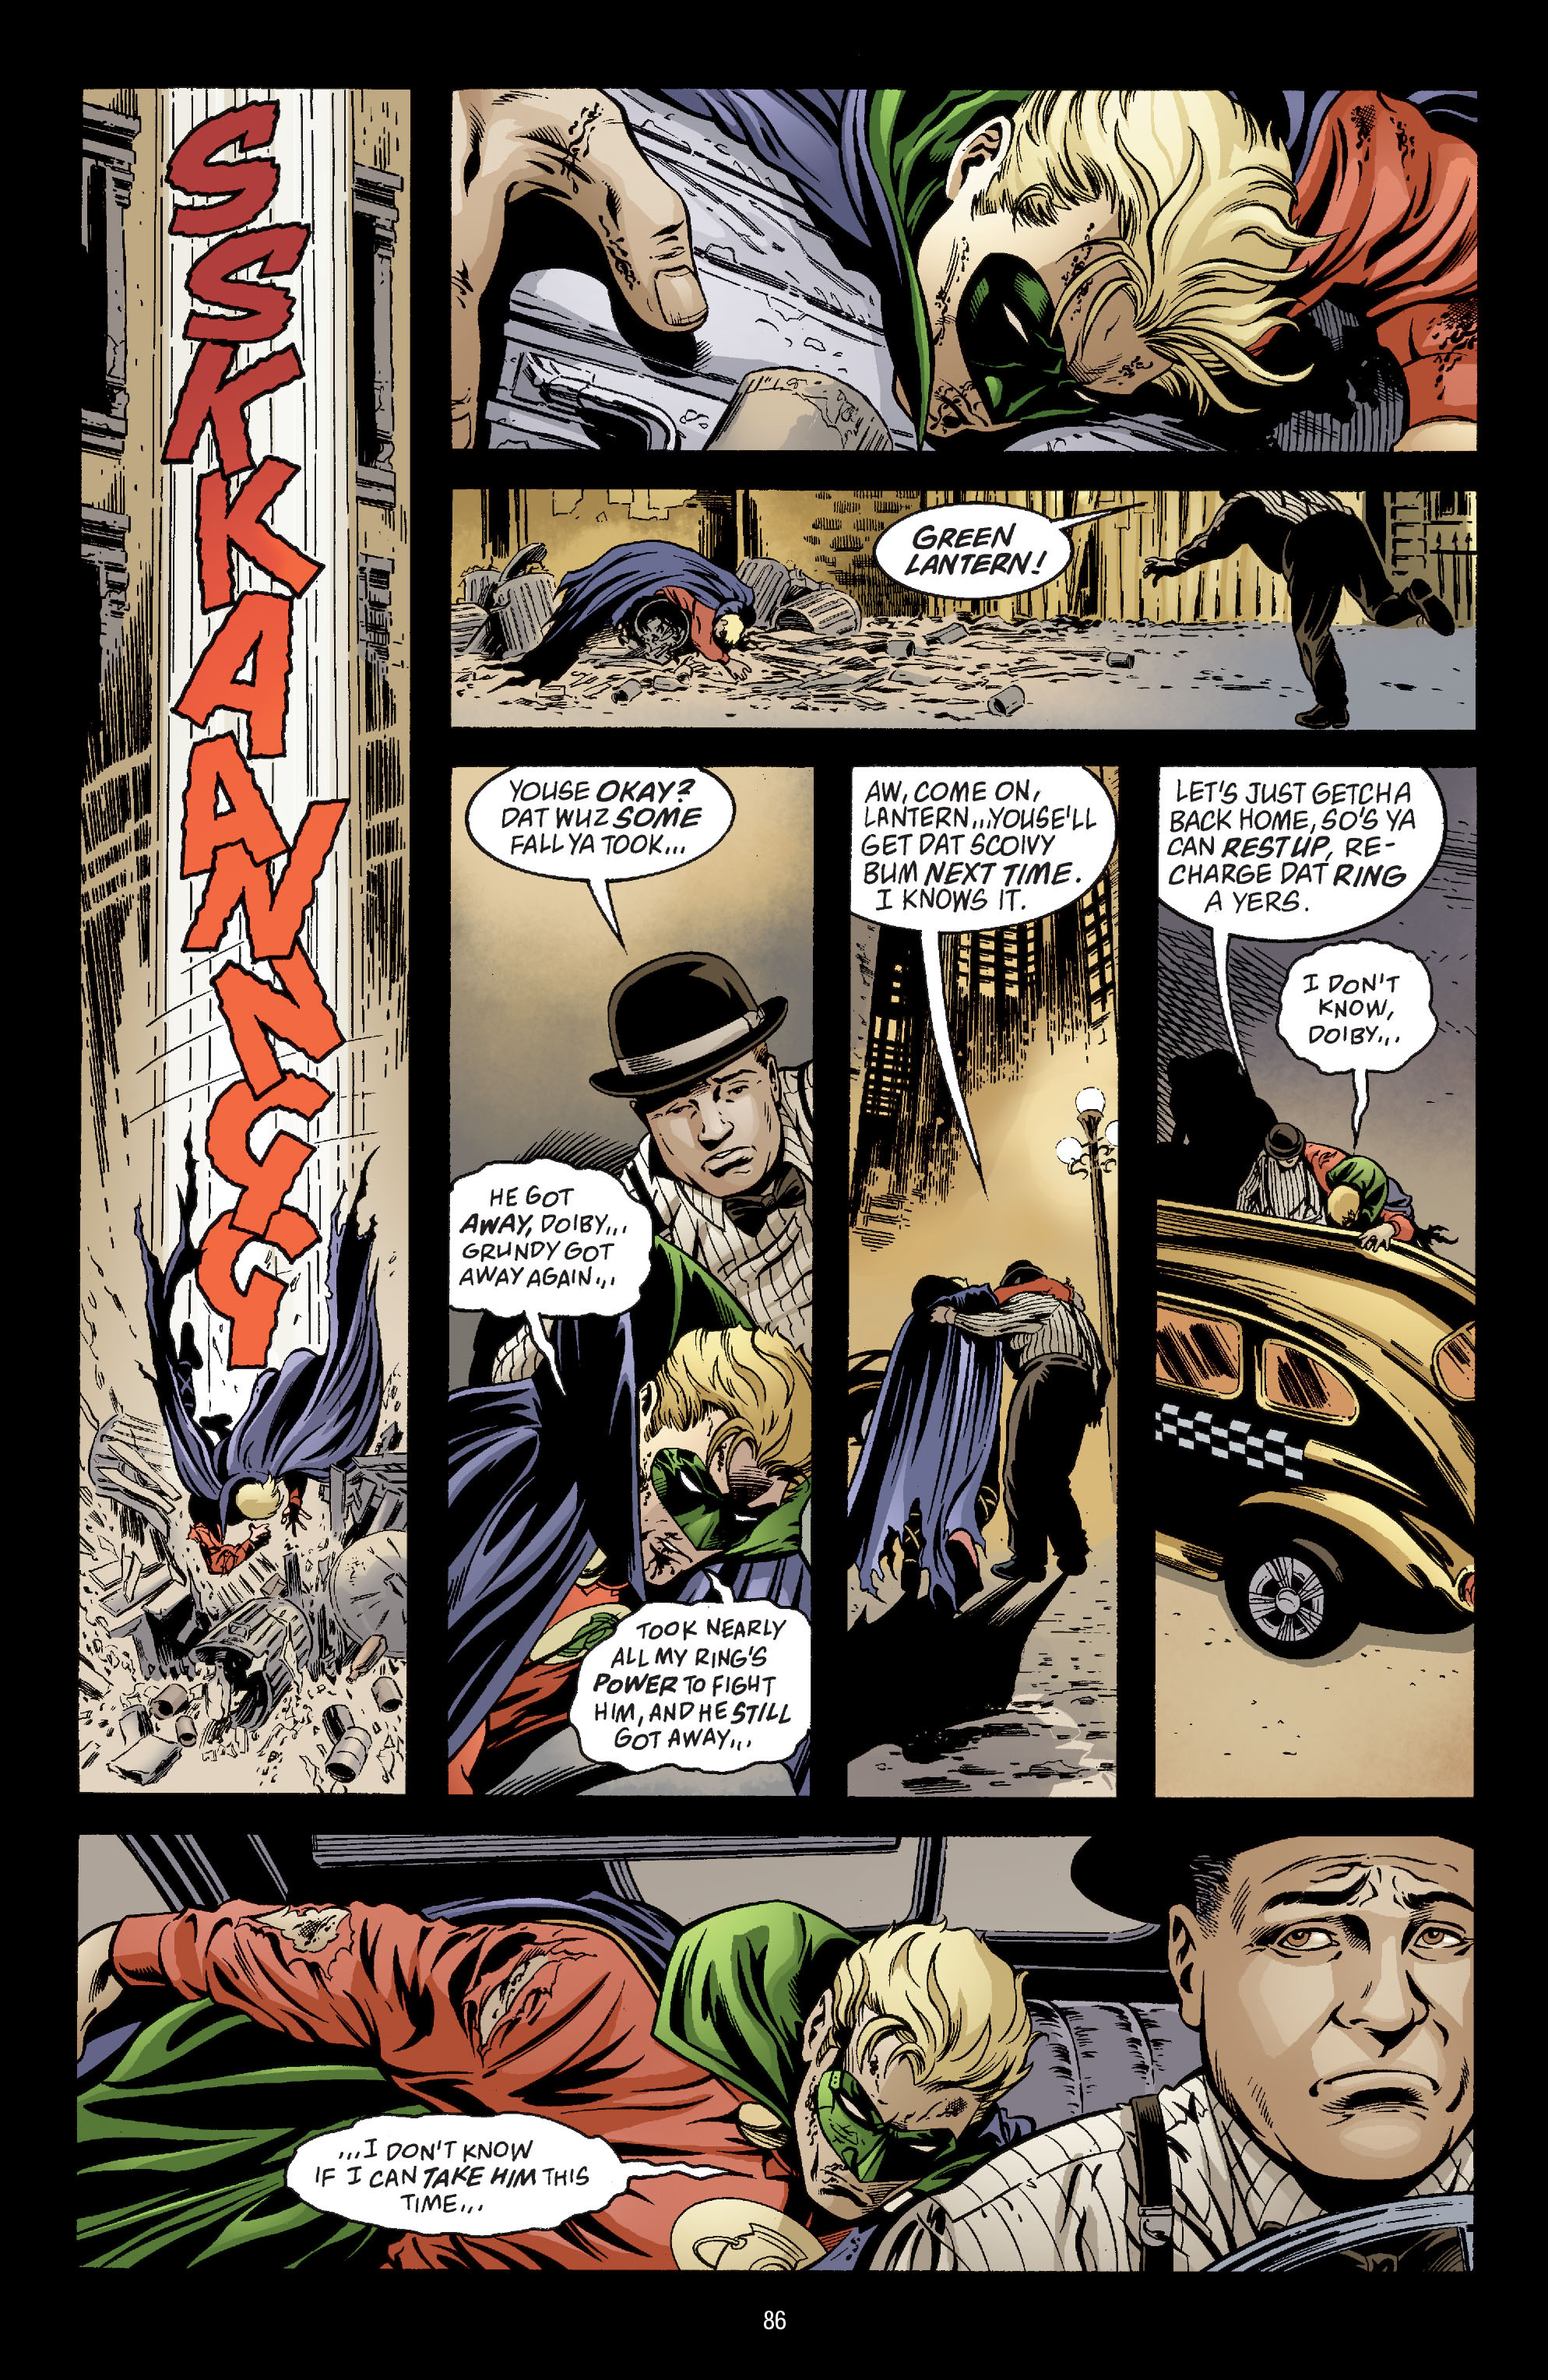 Batman: The Man Who Laughs chap 1 pic 87